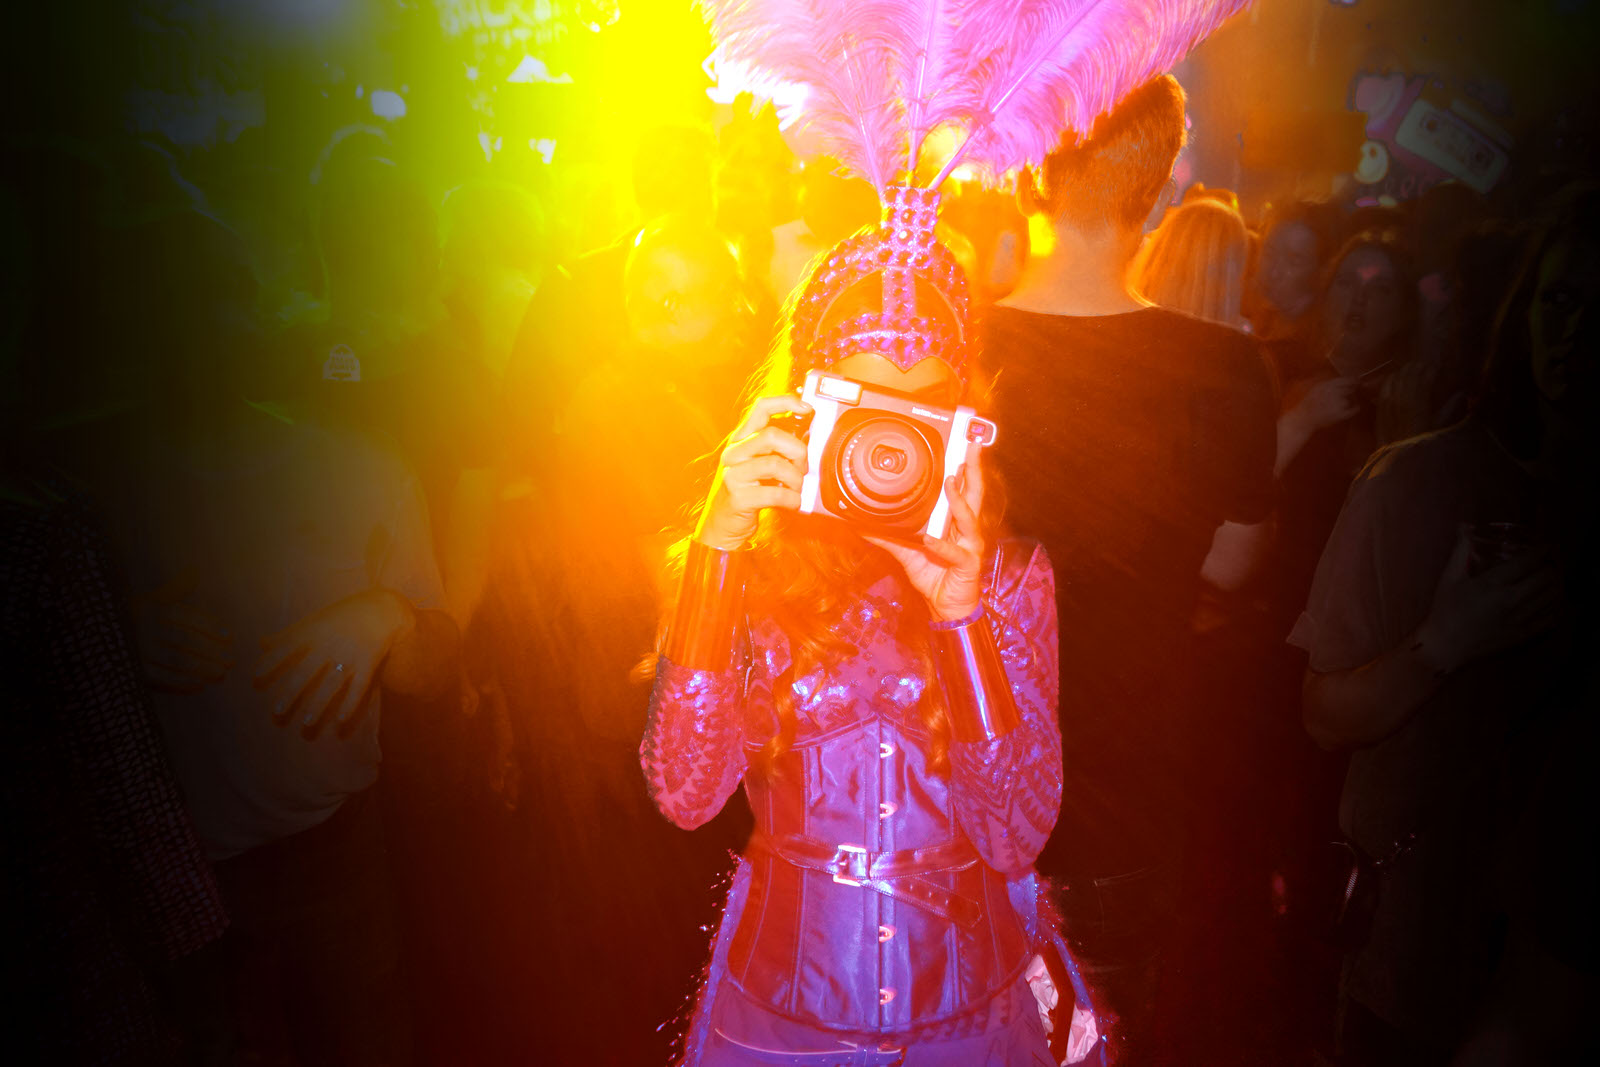 Friday Night out, Clubbing, Uitgaansleven, Polaroid foto act, polaroid foto actie, polaroid hostess, fotomarketing, polaroidmeisje, polaroidfoto, evenementen fotografie